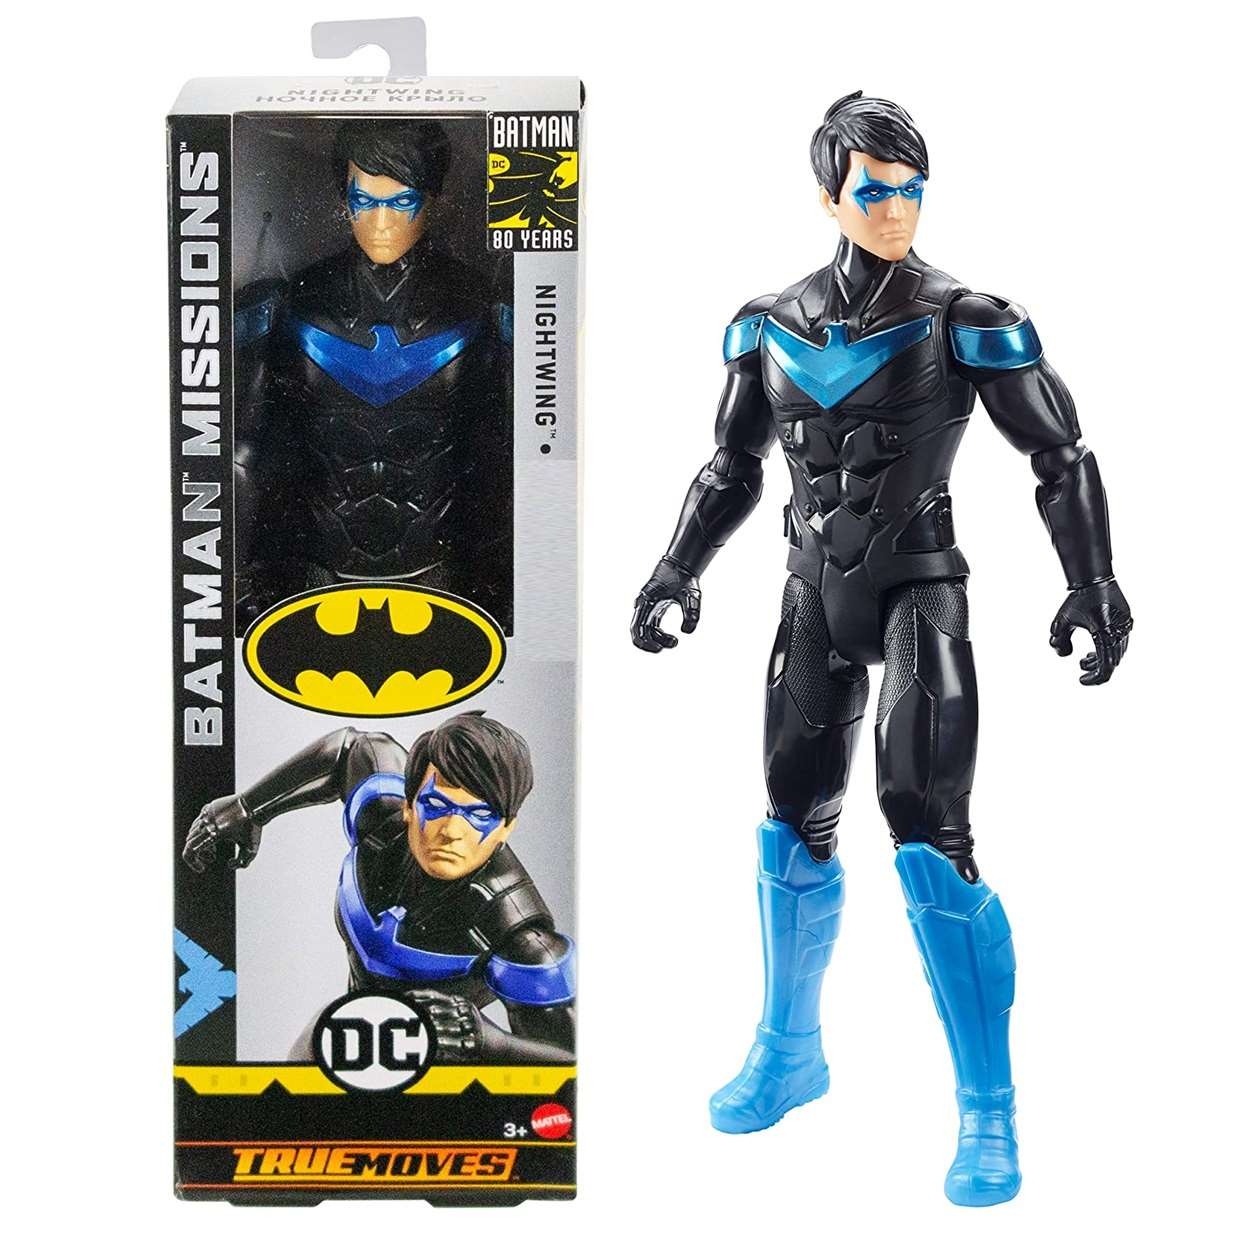 Nightwing Figura Batman Missions Dc Comics True Moves 12 Pulg